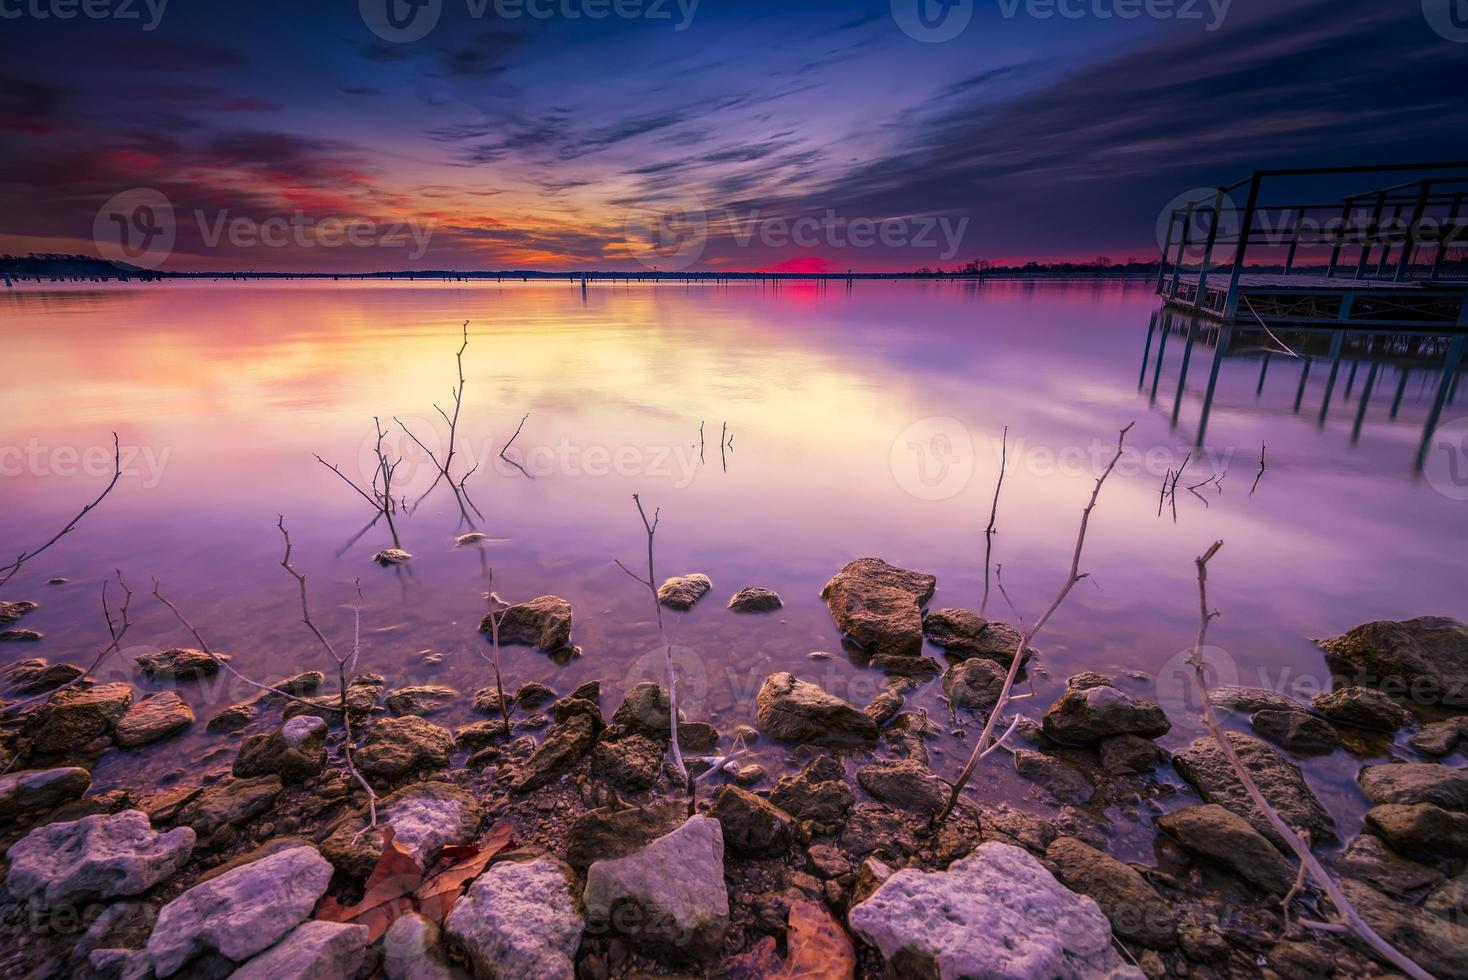 Winter Sunrise over Benbrook Lake photo